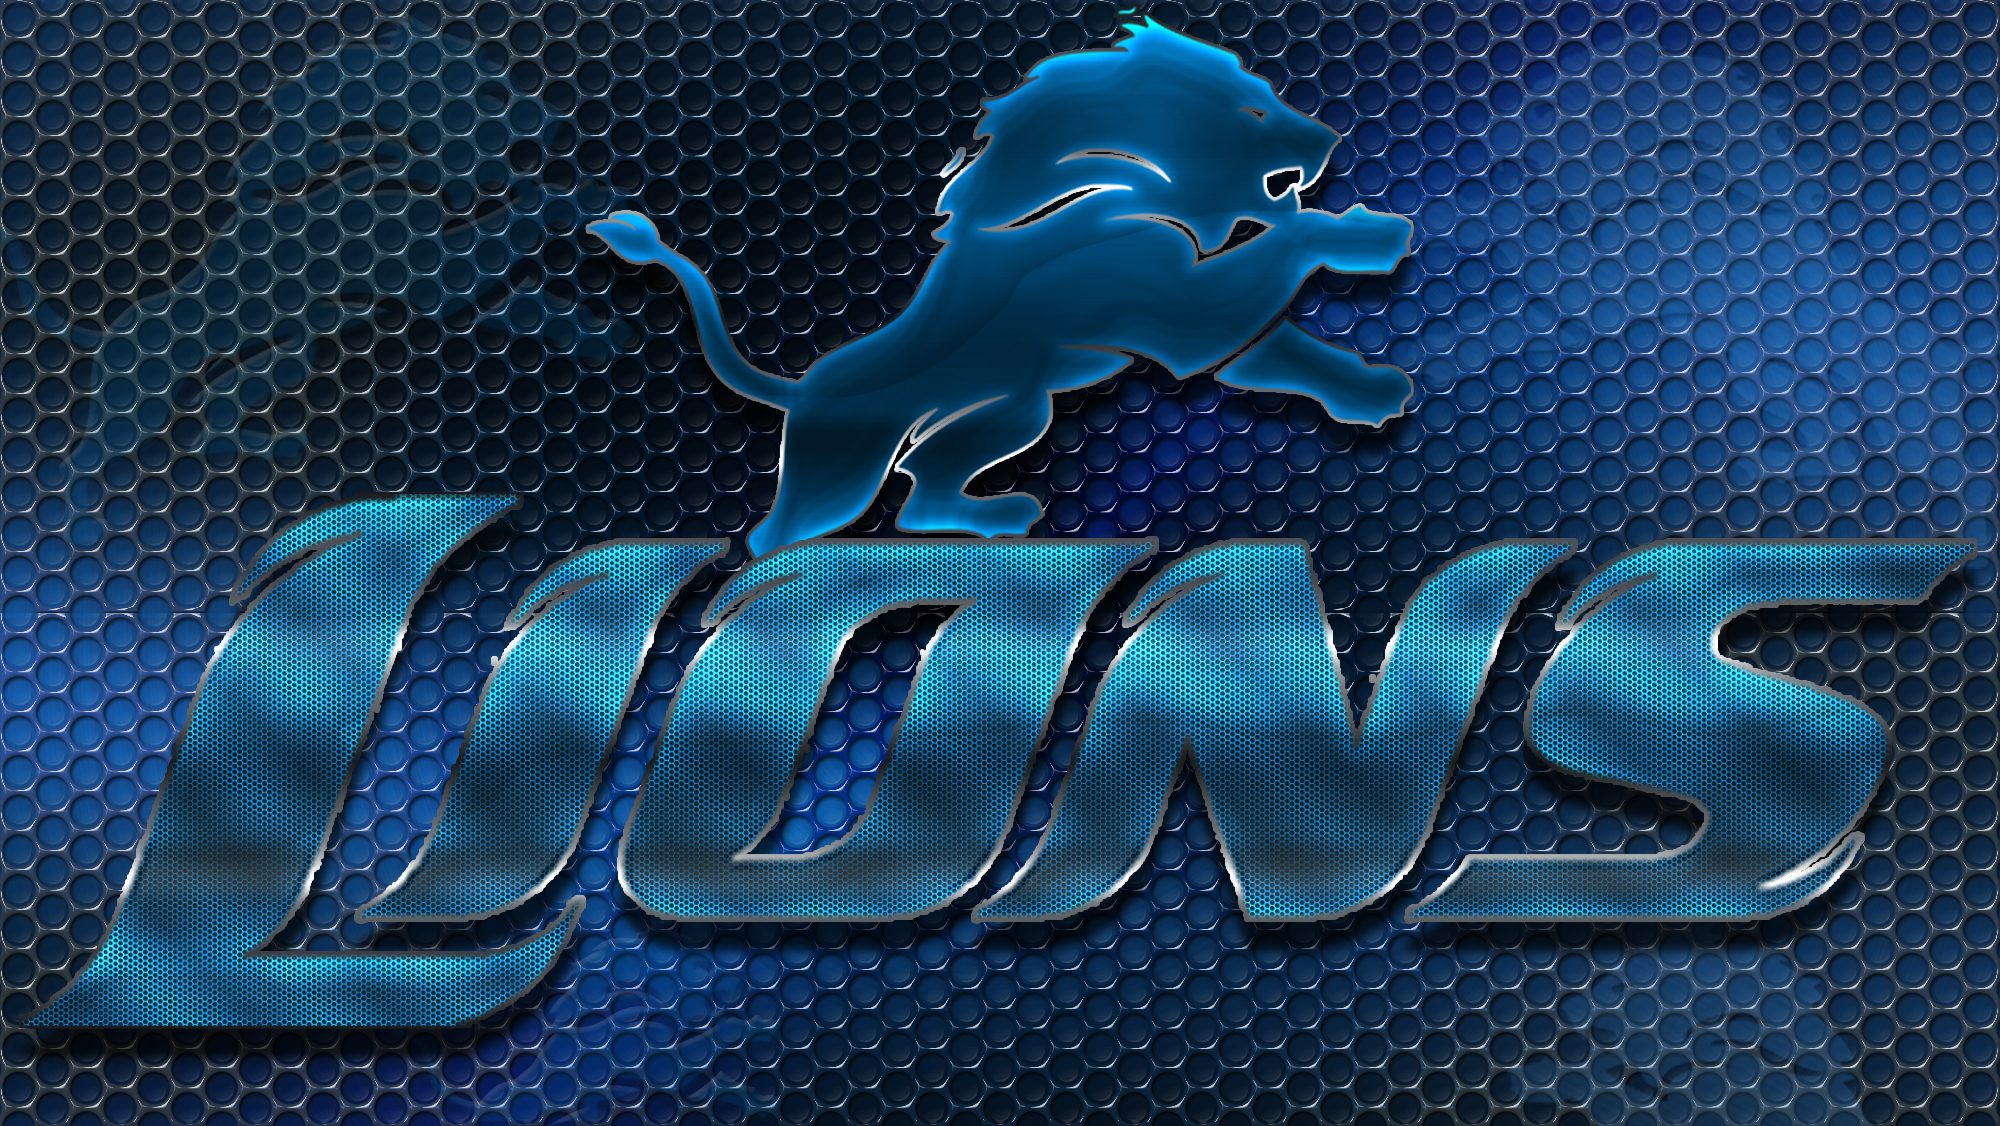 Detroit Lions Detroit Lions Heavy Metal 16x9 Text N Logo Wallpaper by 2000x1126